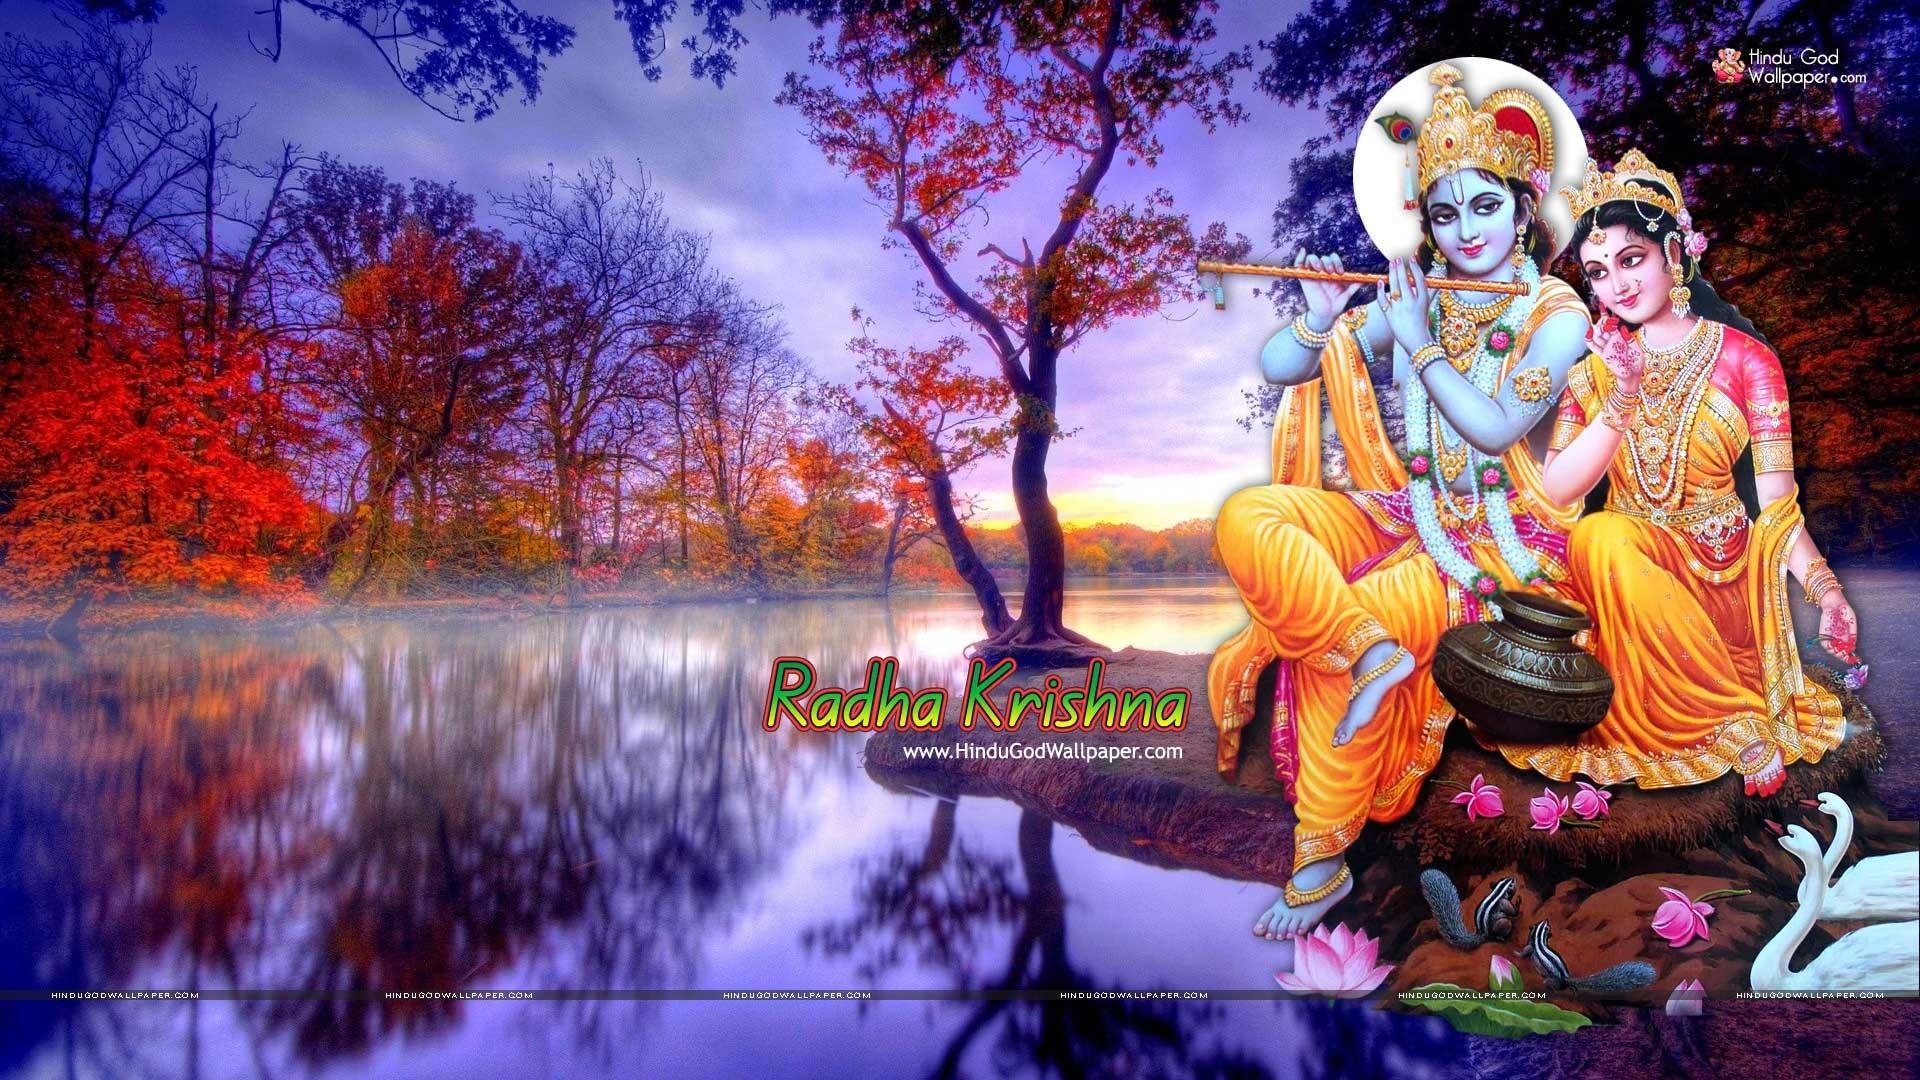 All Hindu Gods Wallpapers Desktop Wallpaper